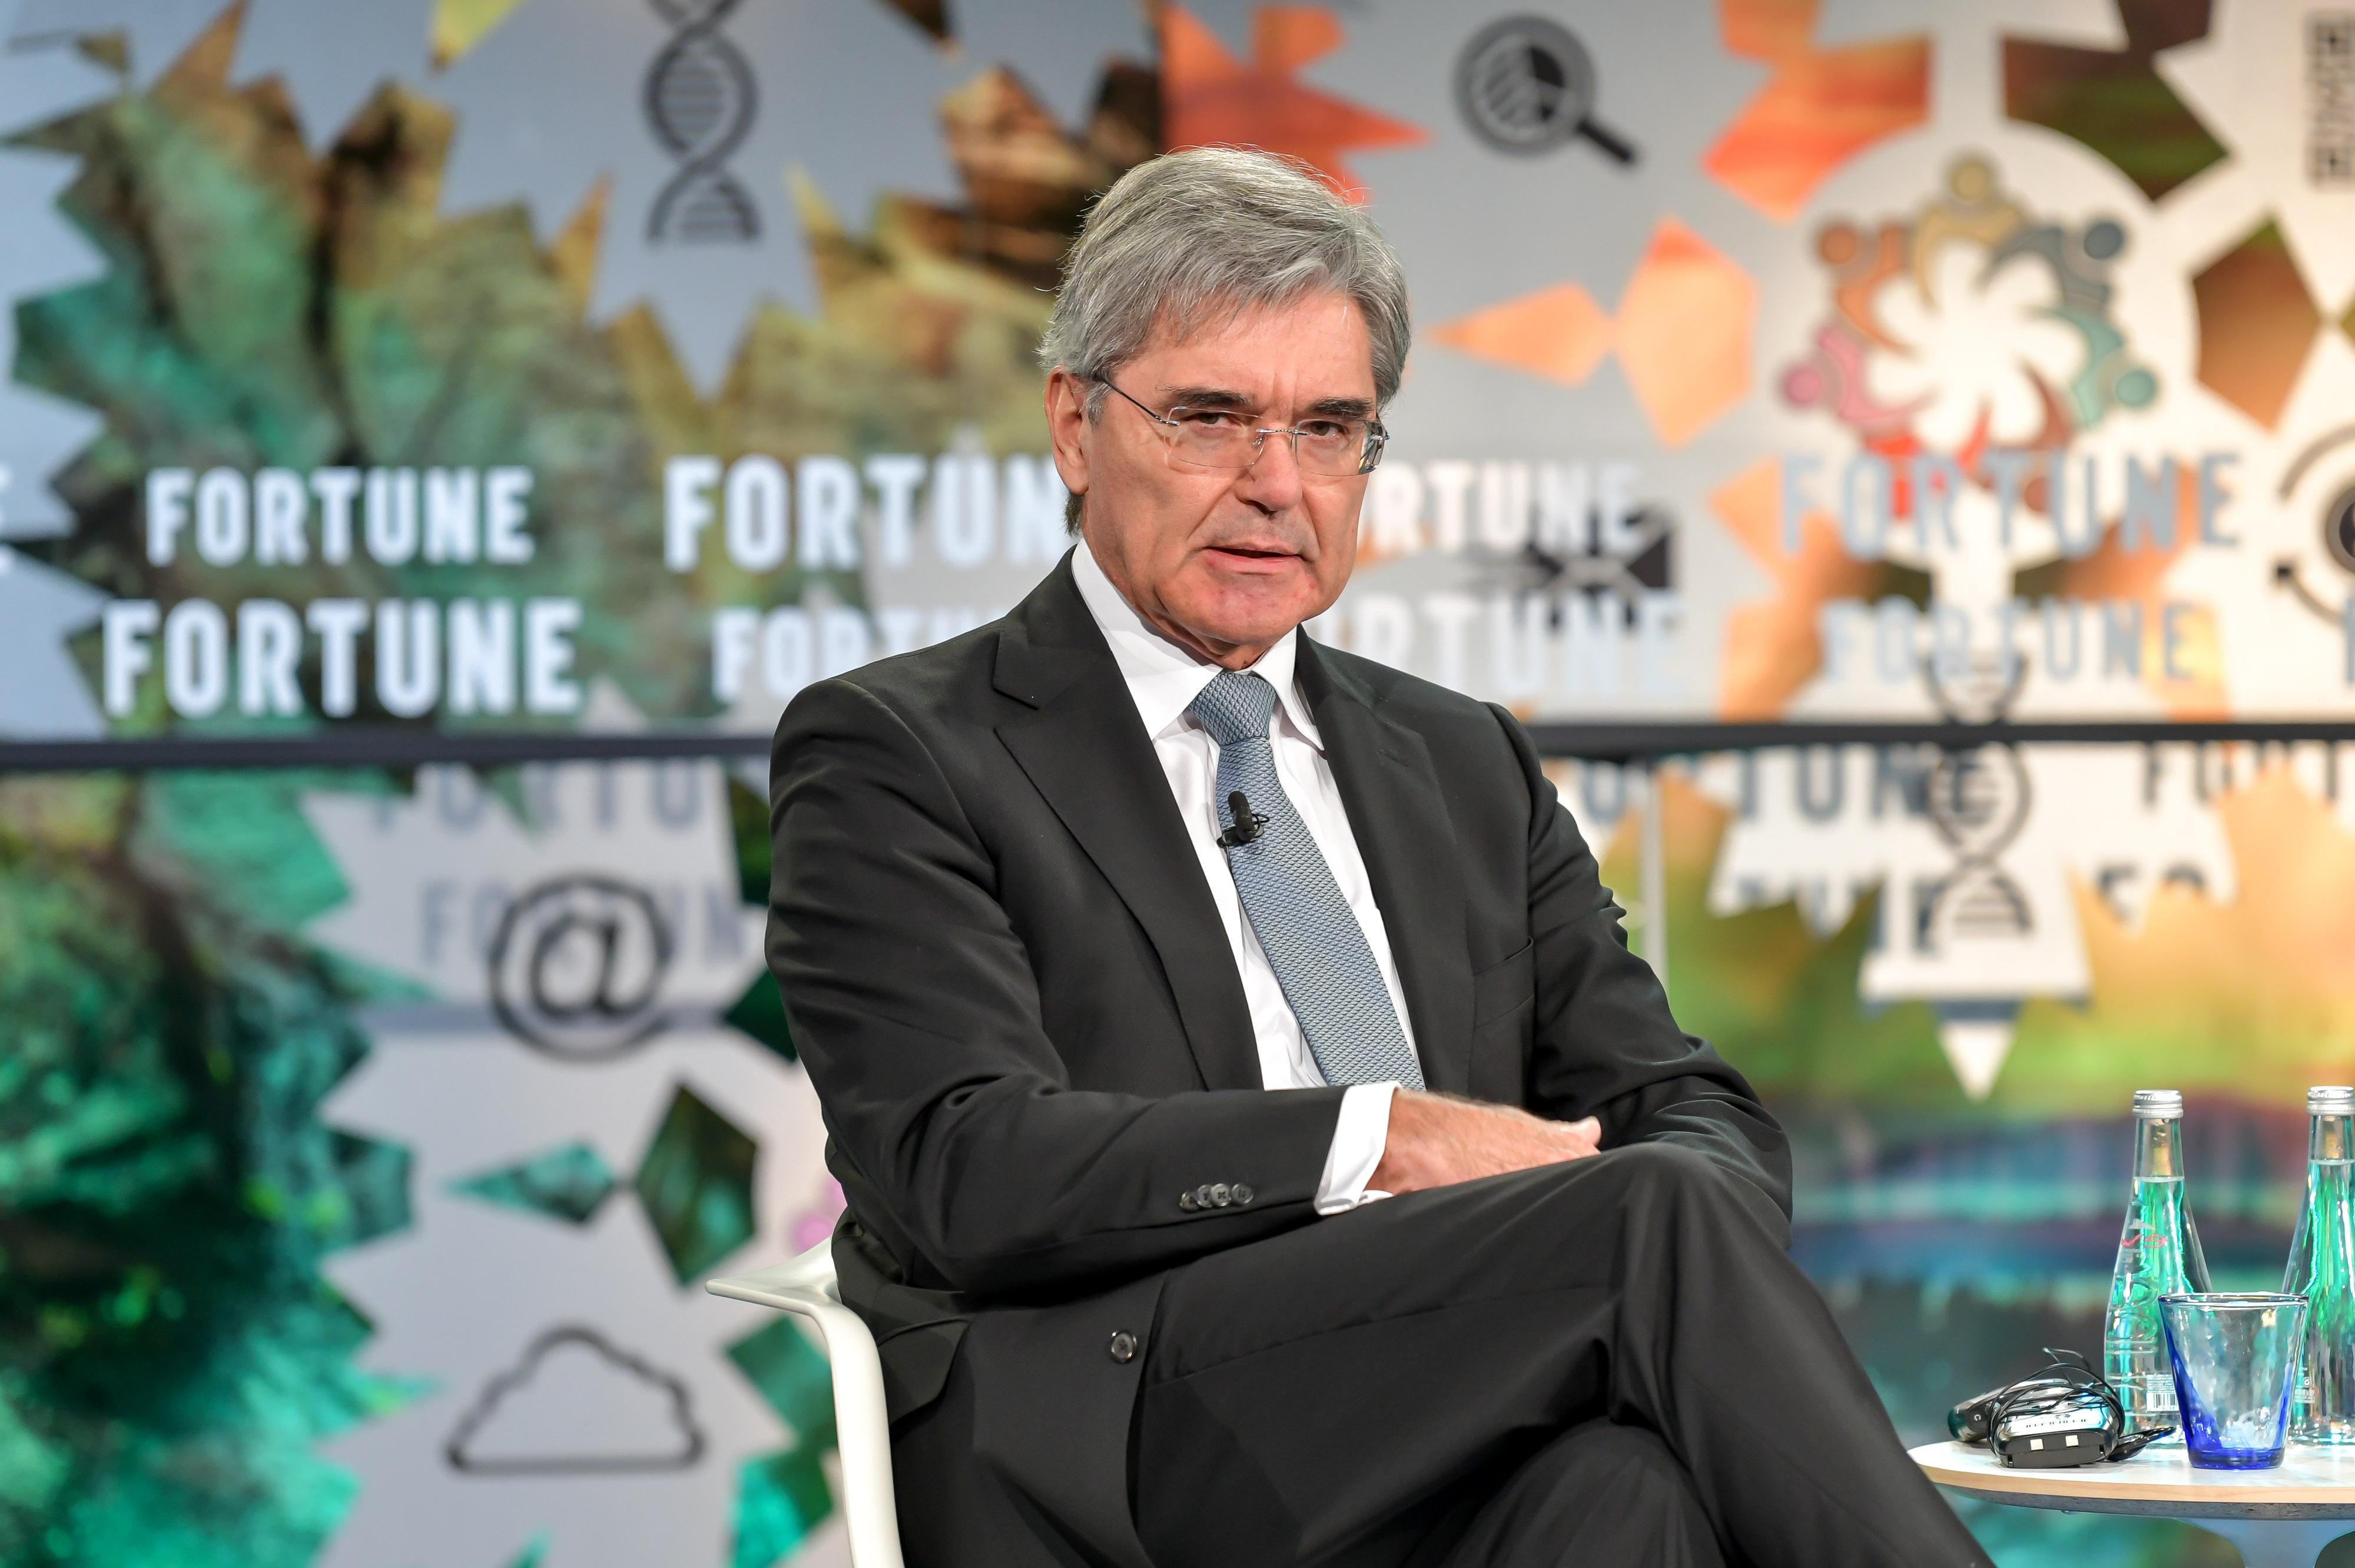 Siemens CEO Joe Kaeser at the Fortune Global Forum 2018